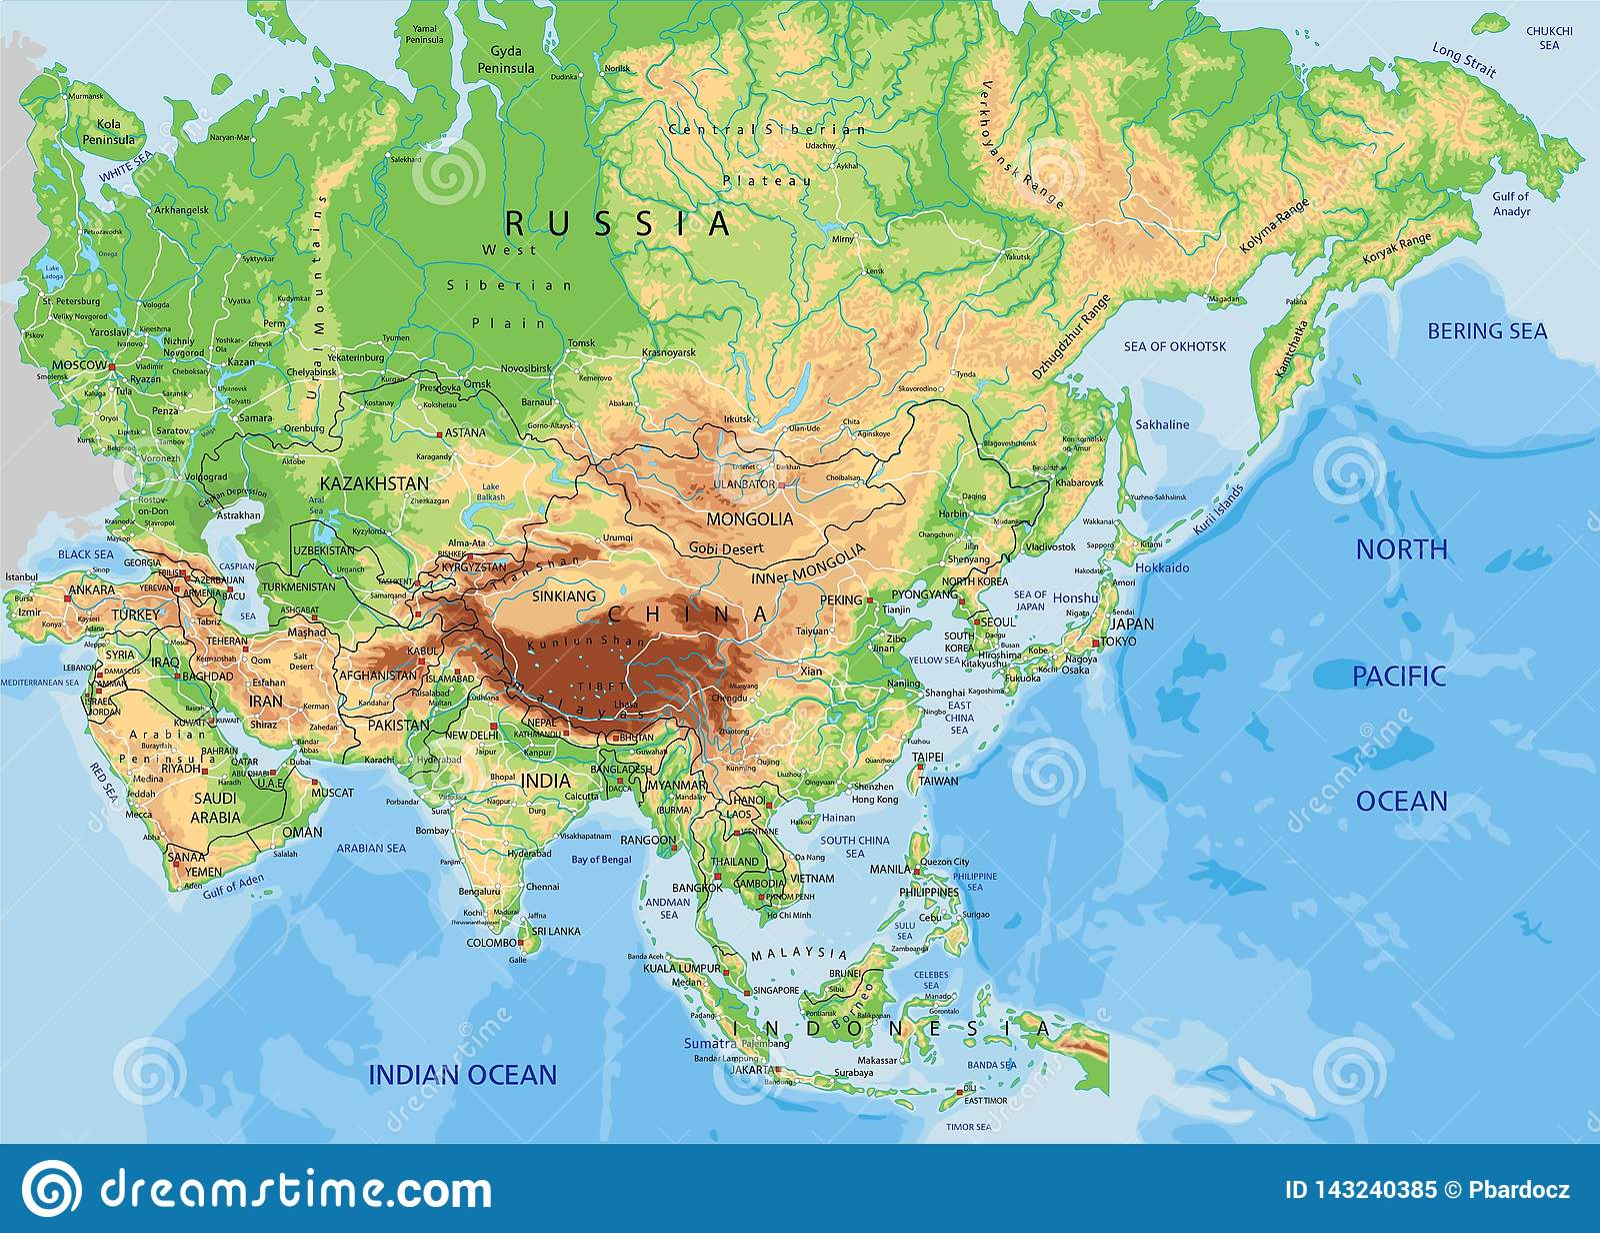 Cartina Asia Fisica.Detailed Asia Stock Illustrations 23 845 Detailed Asia Stock Illustrations Vectors Clipart Dreamstime